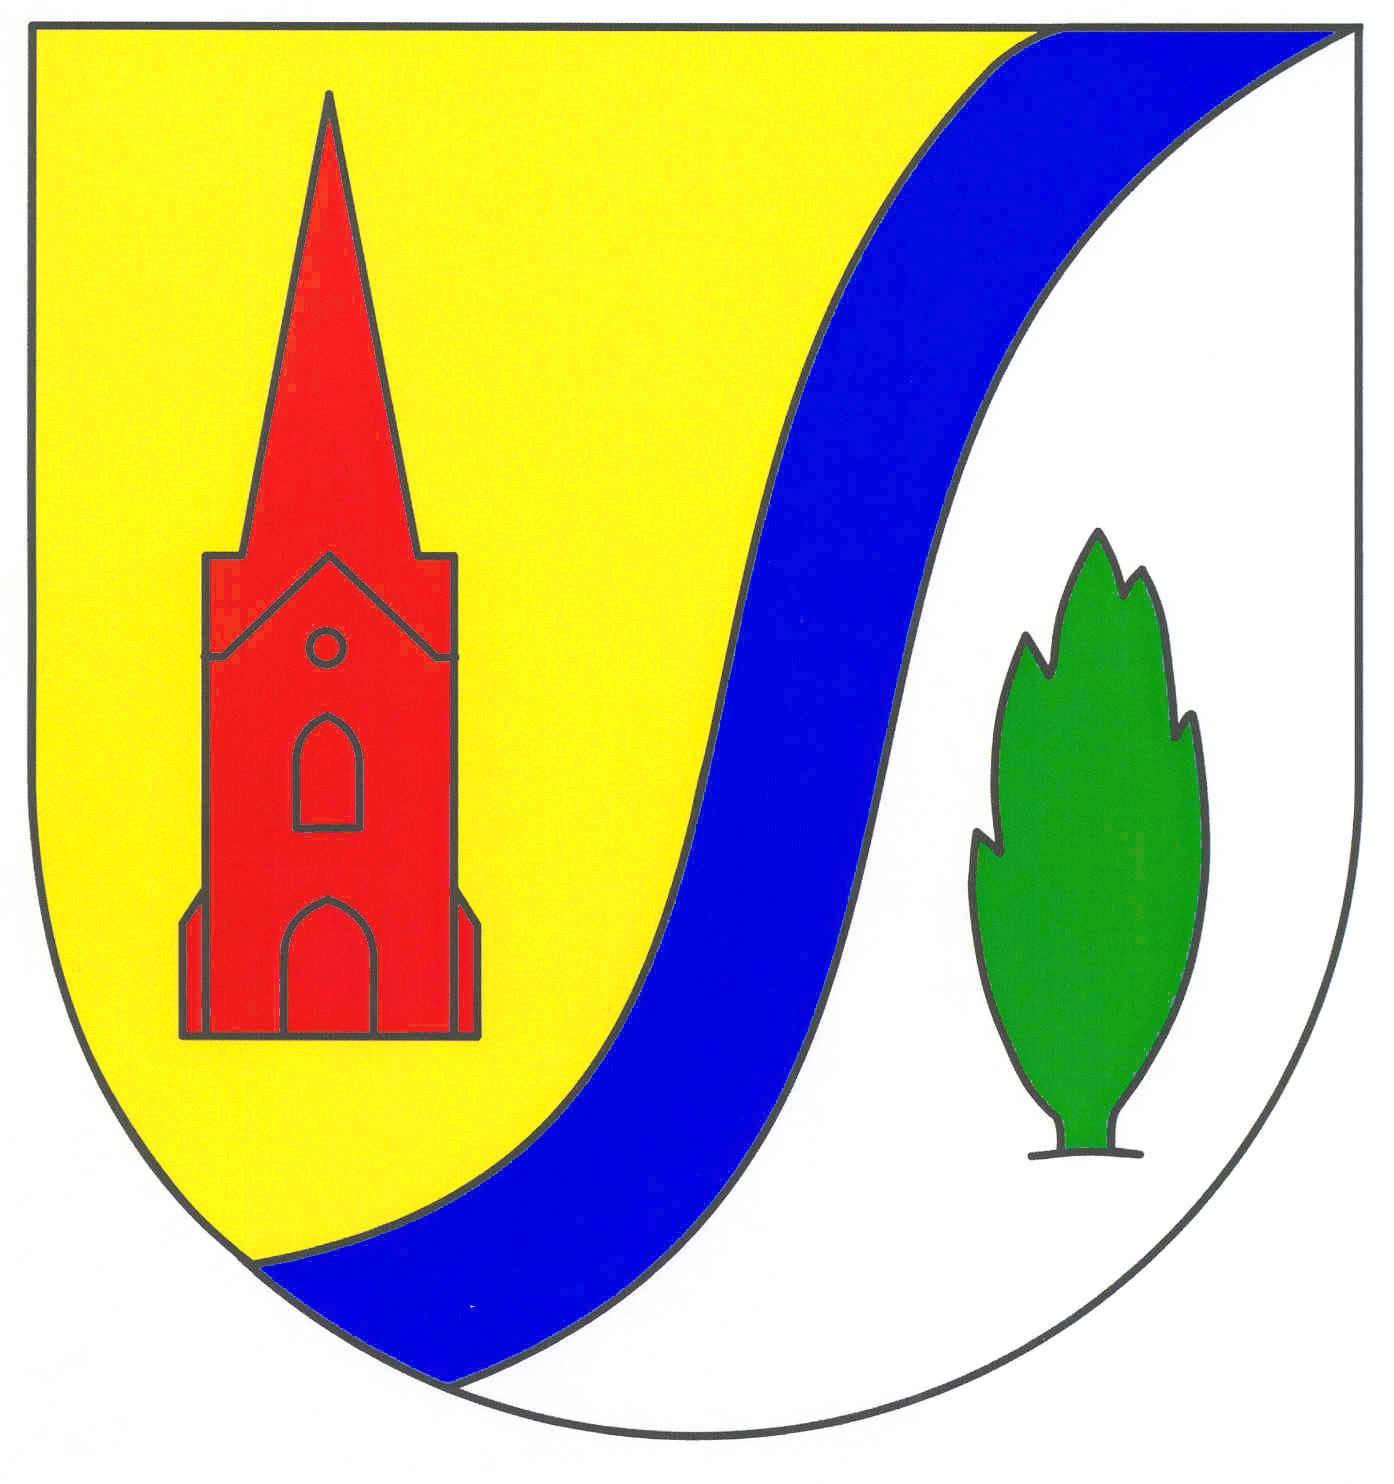 Wappen GemeindeDrelsdorf, Kreis Nordfriesland